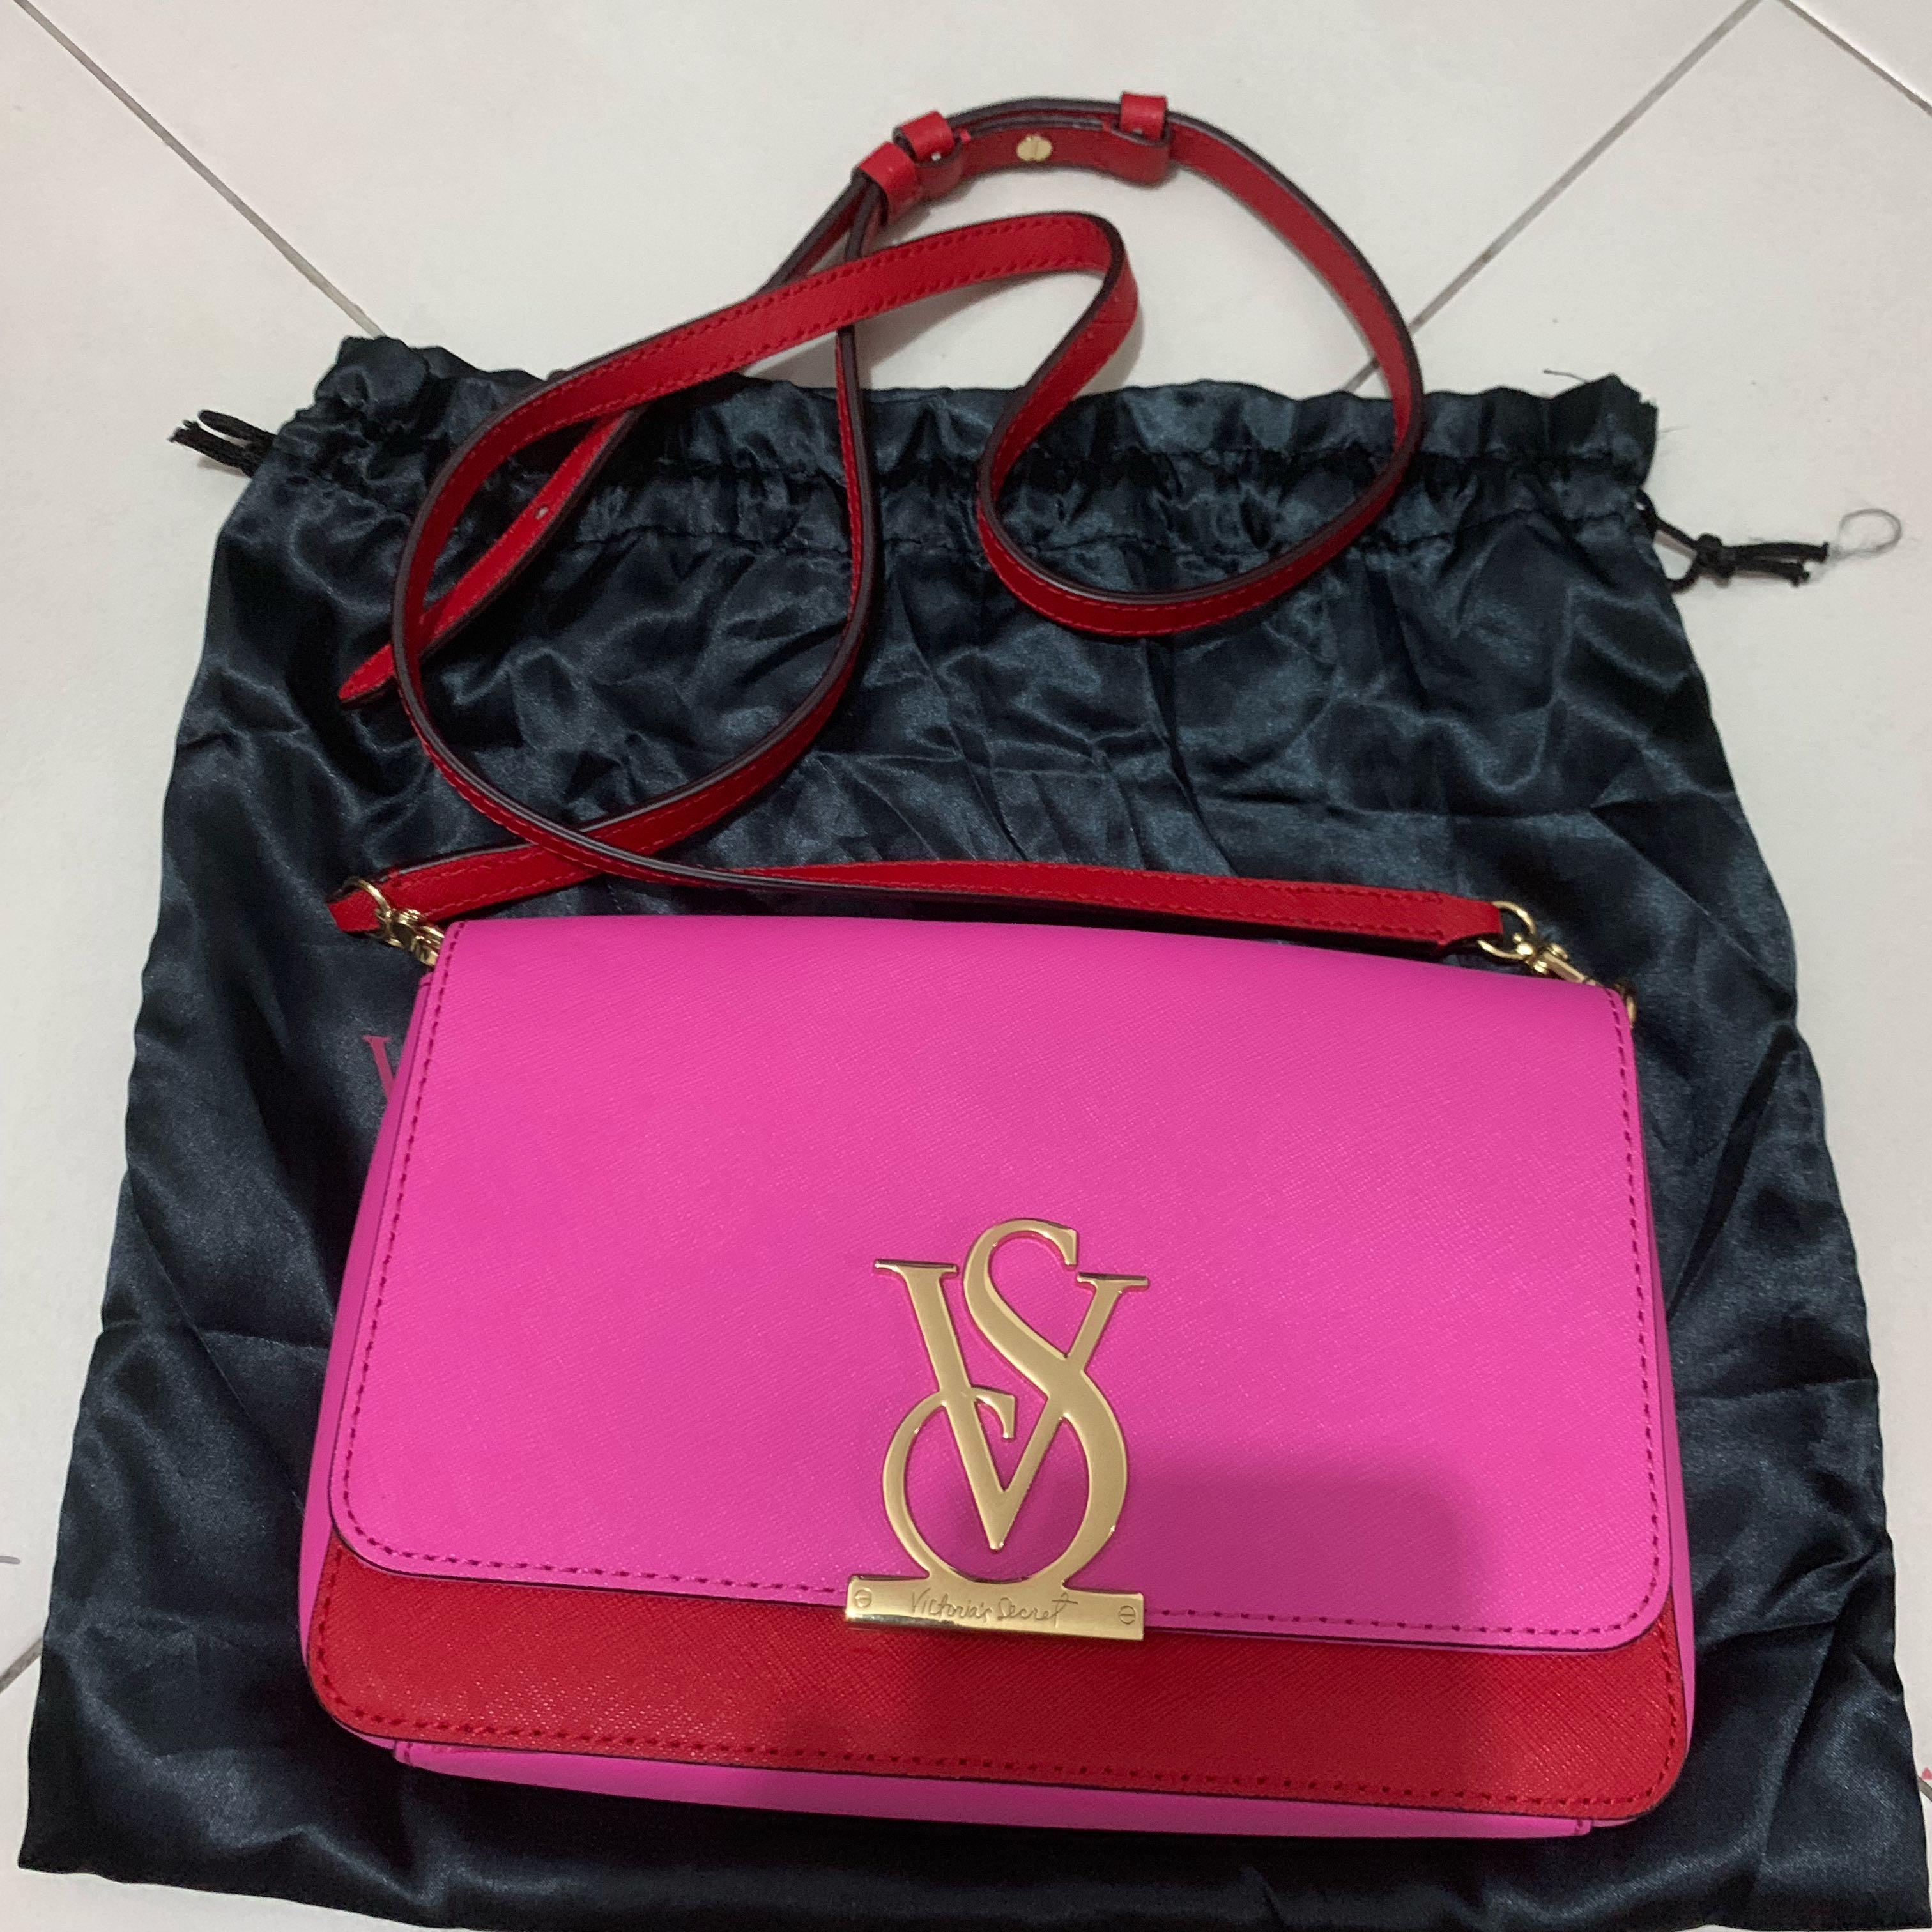 74ce6cb6941f3f Home · Women's Fashion · Bags & Wallets · Sling Bags. photo photo photo  photo